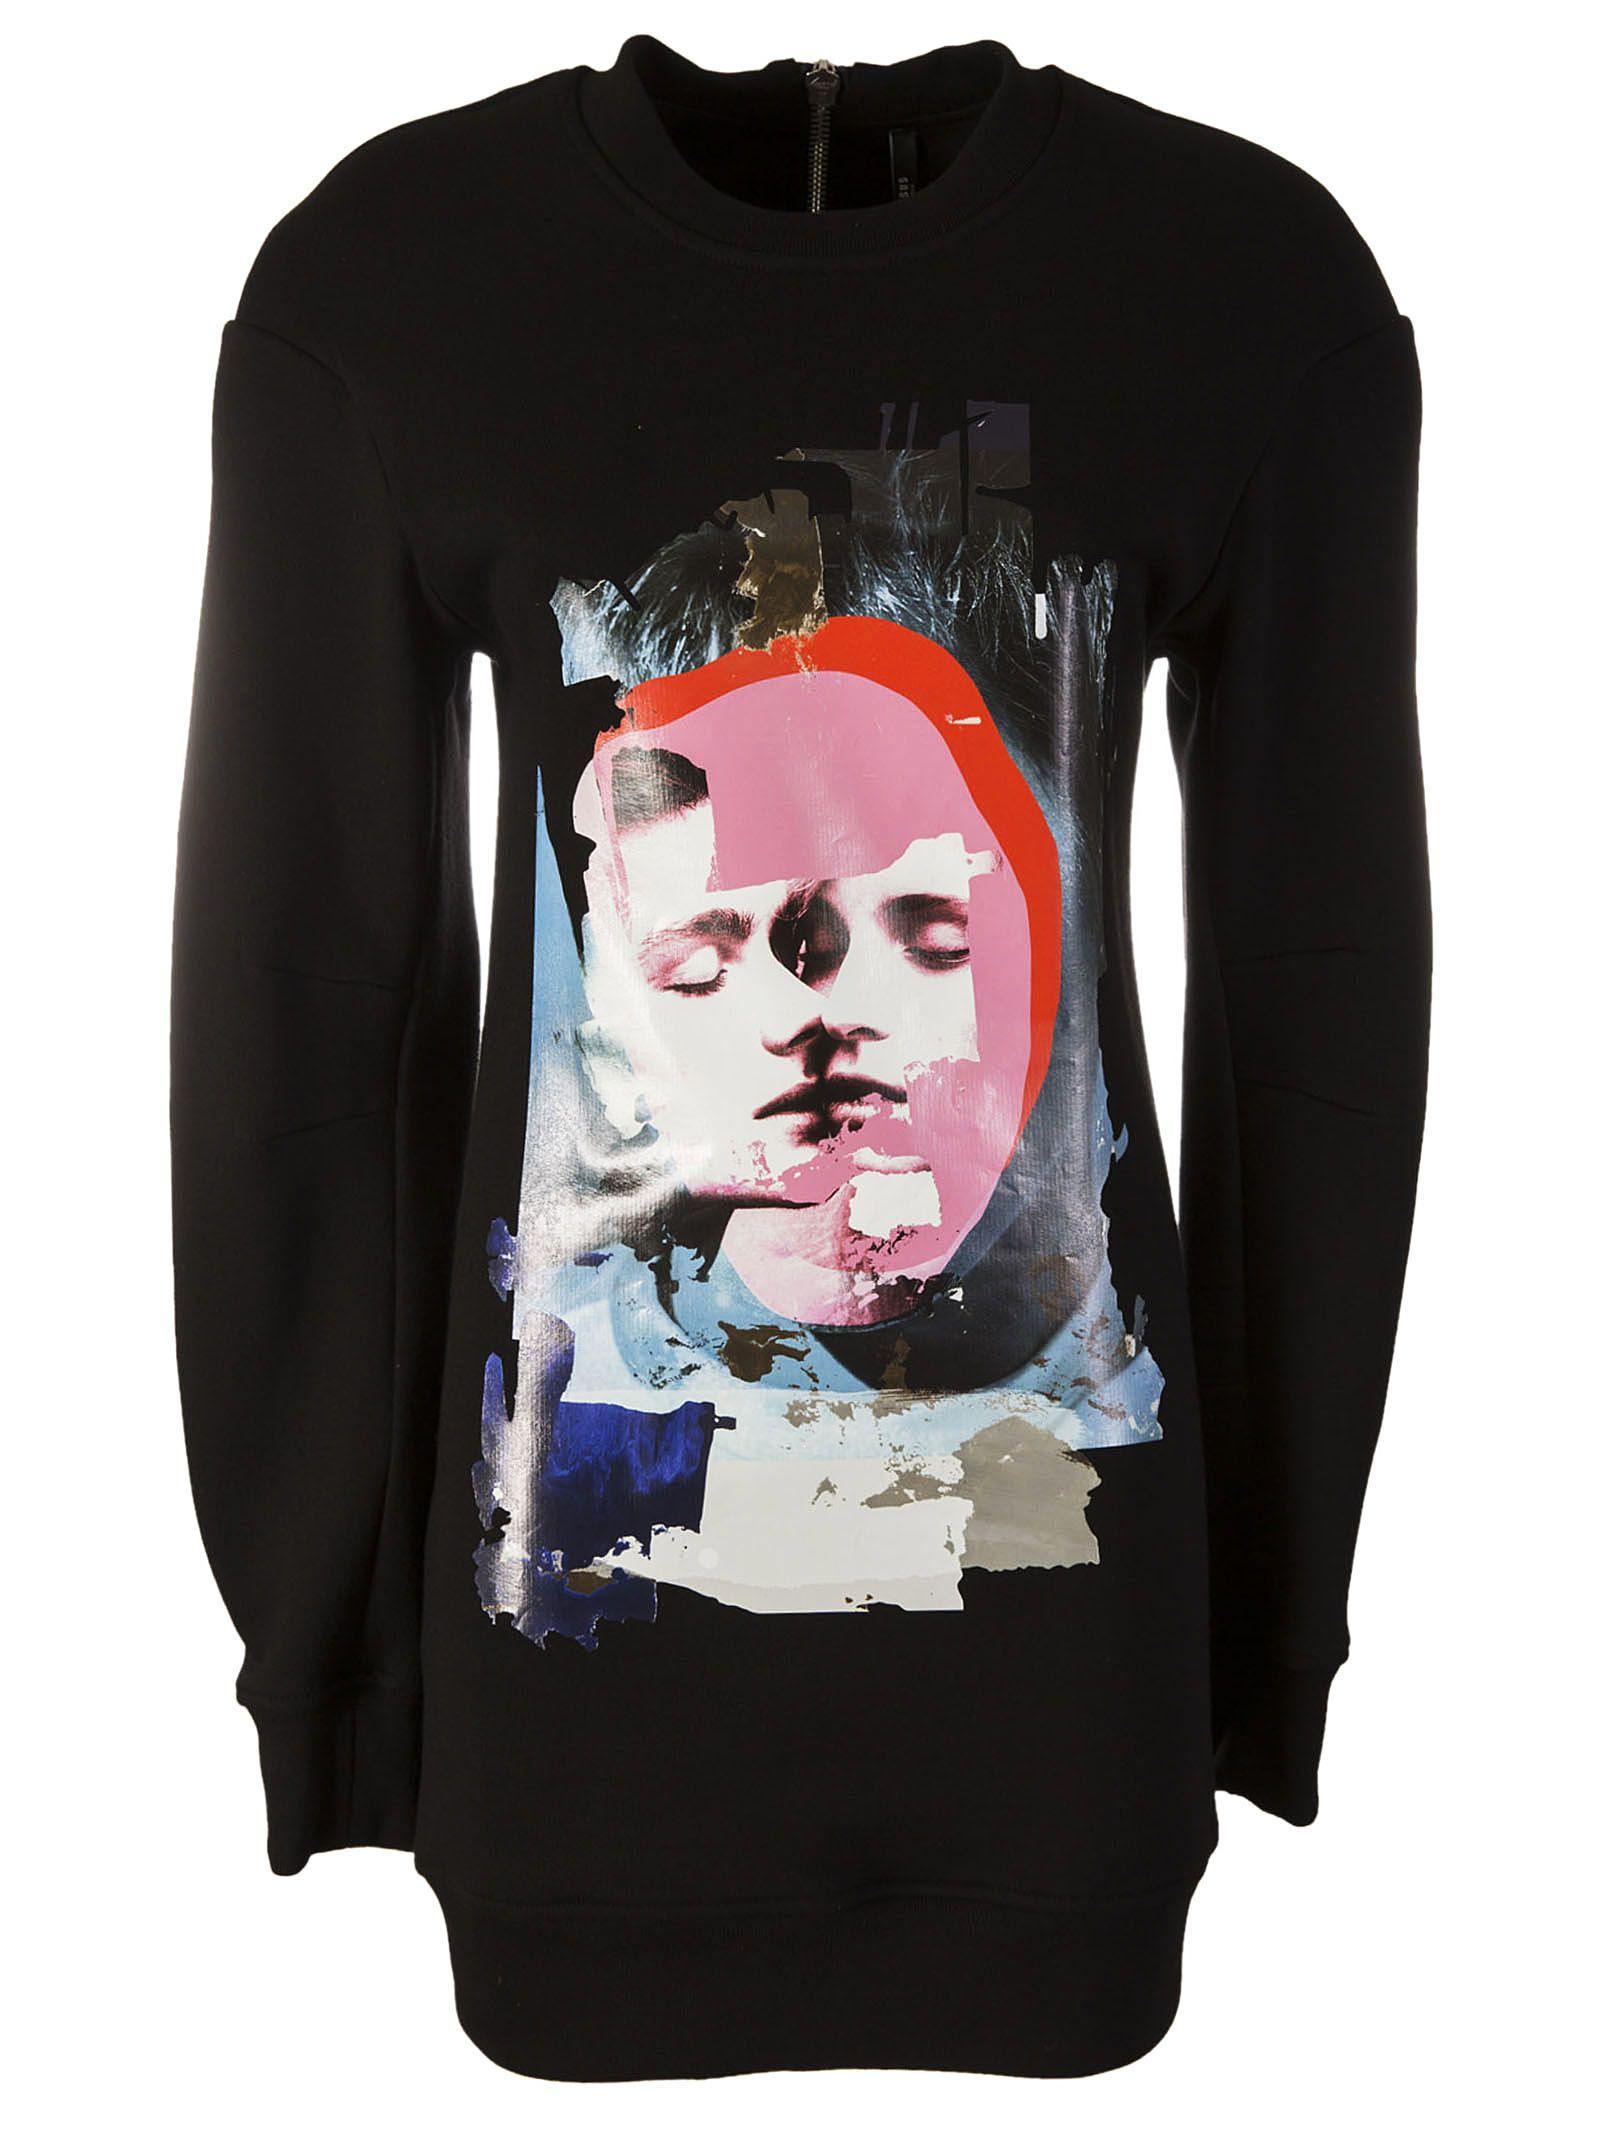 Versus Bruce Kiss Sweatshirt